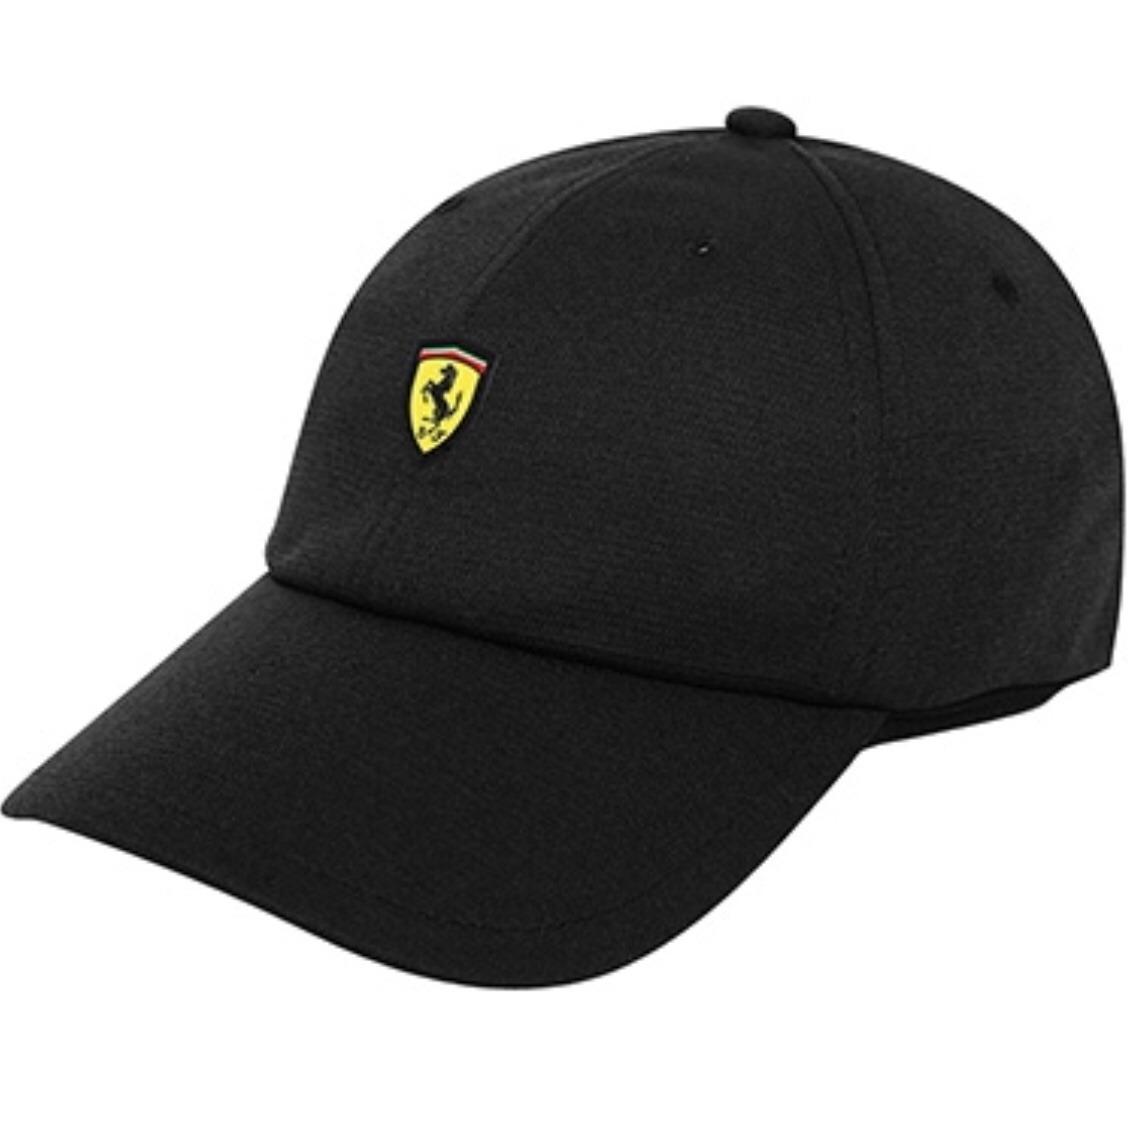 Gorra Puma Fanwear Ferrari Negra Envío Gratis -   798.00 en Mercado ... 1a9e125919f